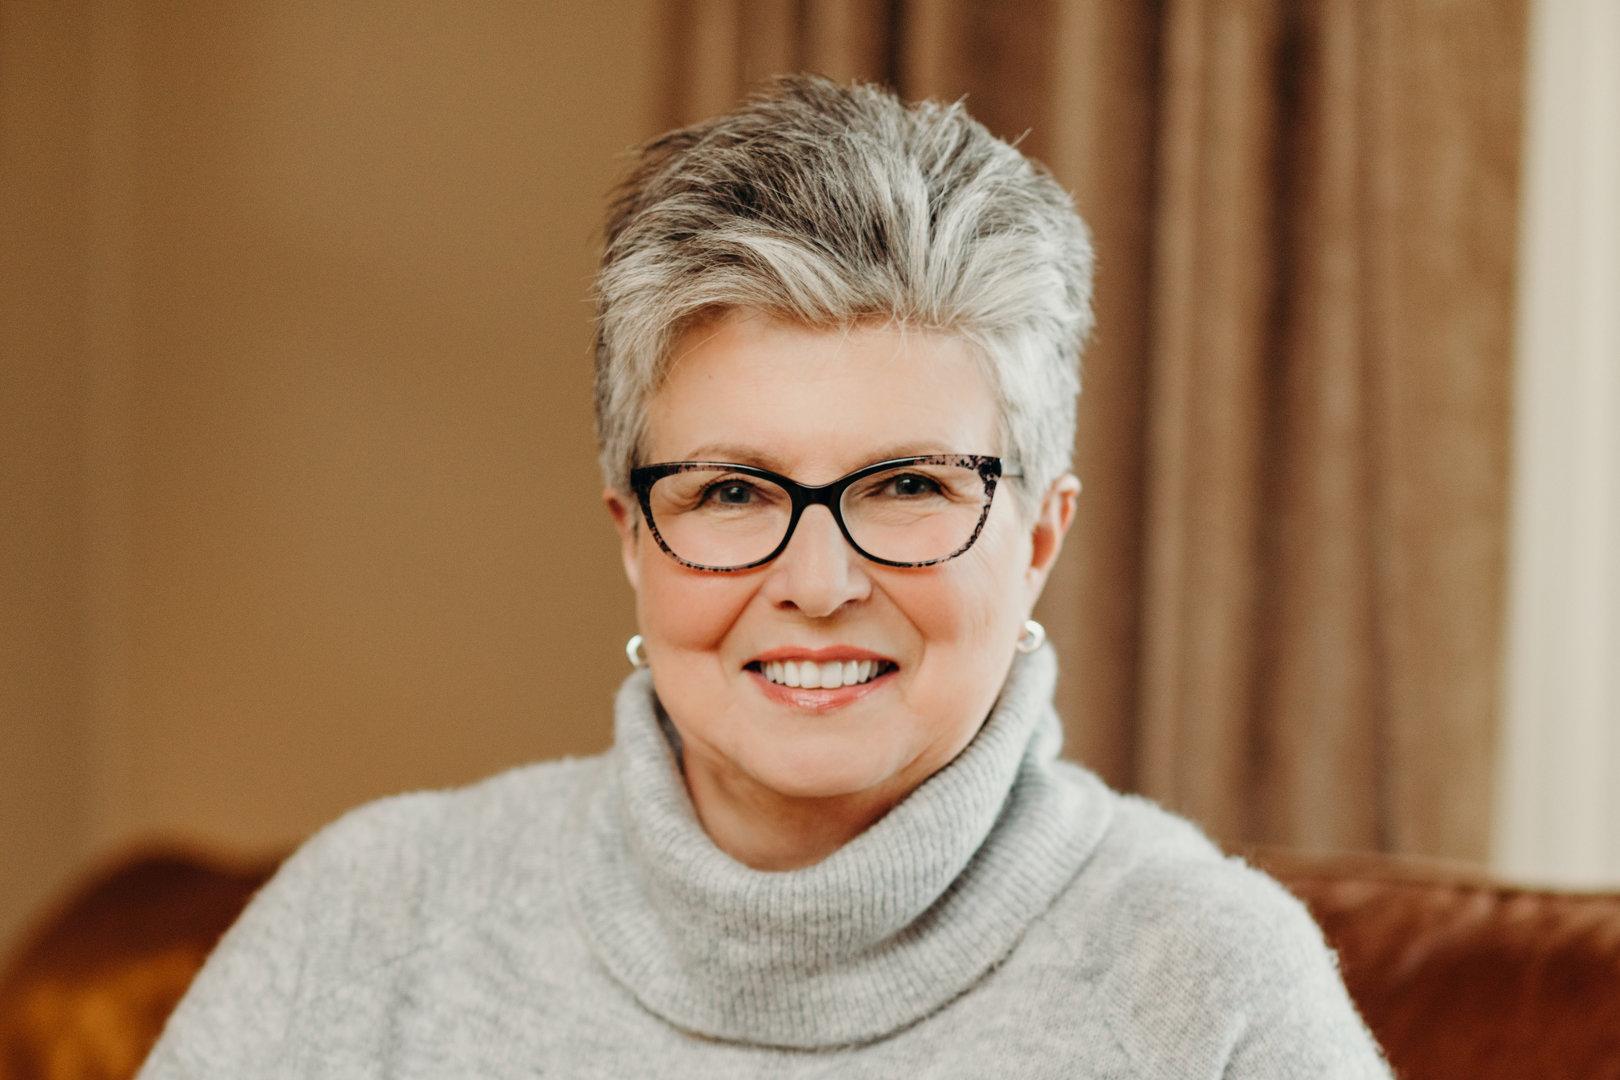 Lynda B. Schmidt - L.B.SCHMIDT - CREATIVE SERVICES